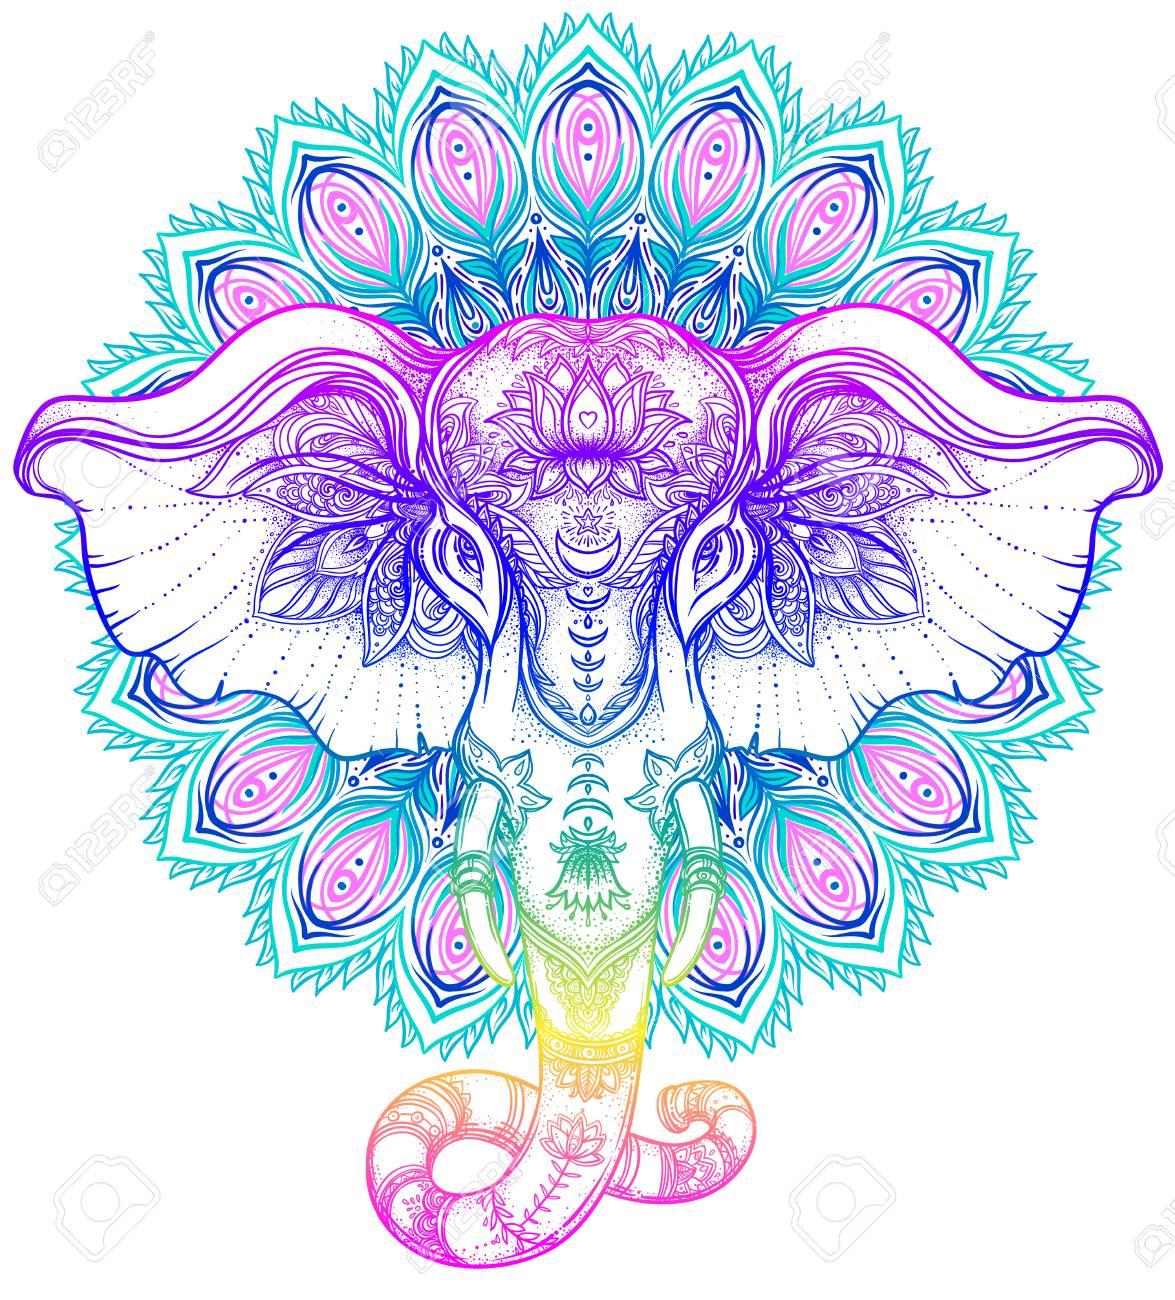 Beautiful hand-drawn tribal style elephant over mandala. Colorful design with boho pattern, psychedelic ornaments. Ethnic poster, spiritual art, yoga. Indian god Ganesha, Indian symbol. T-shirt print. - 79138111